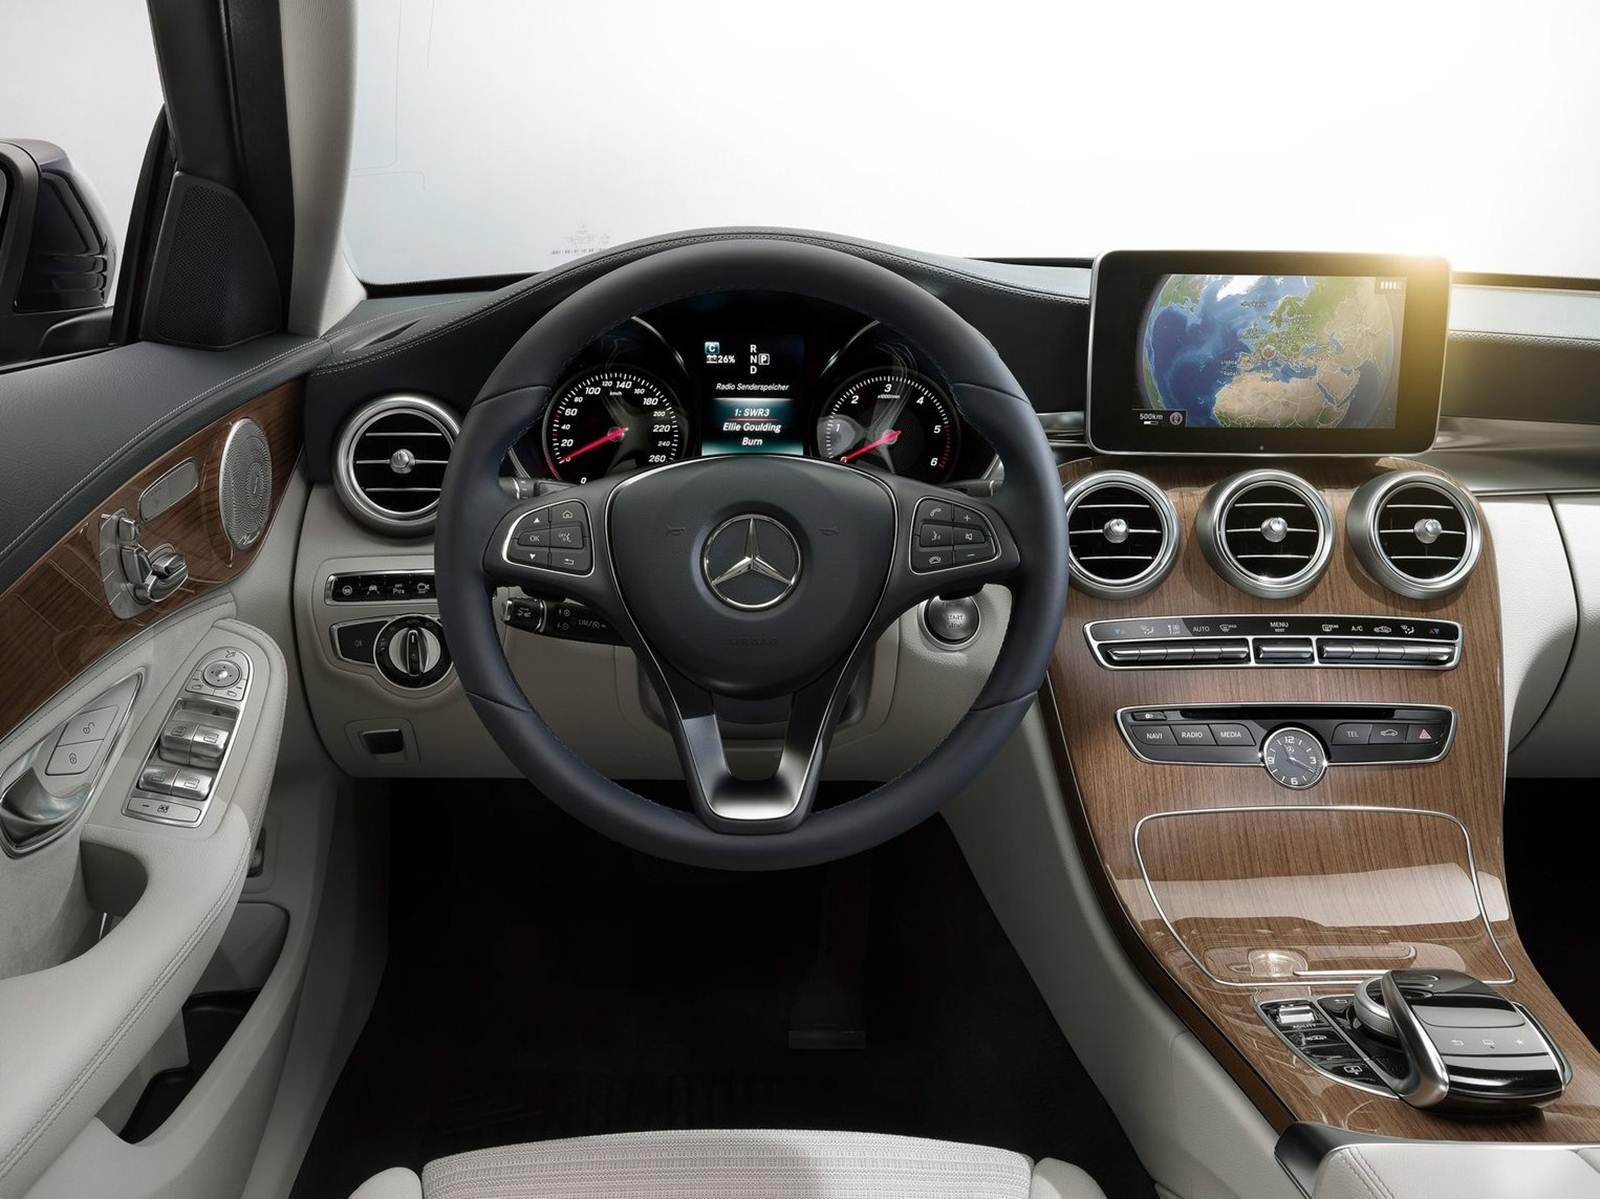 Novo mercedes classe c pre o no brasil r 160 mil car for Interior mercedes clase c